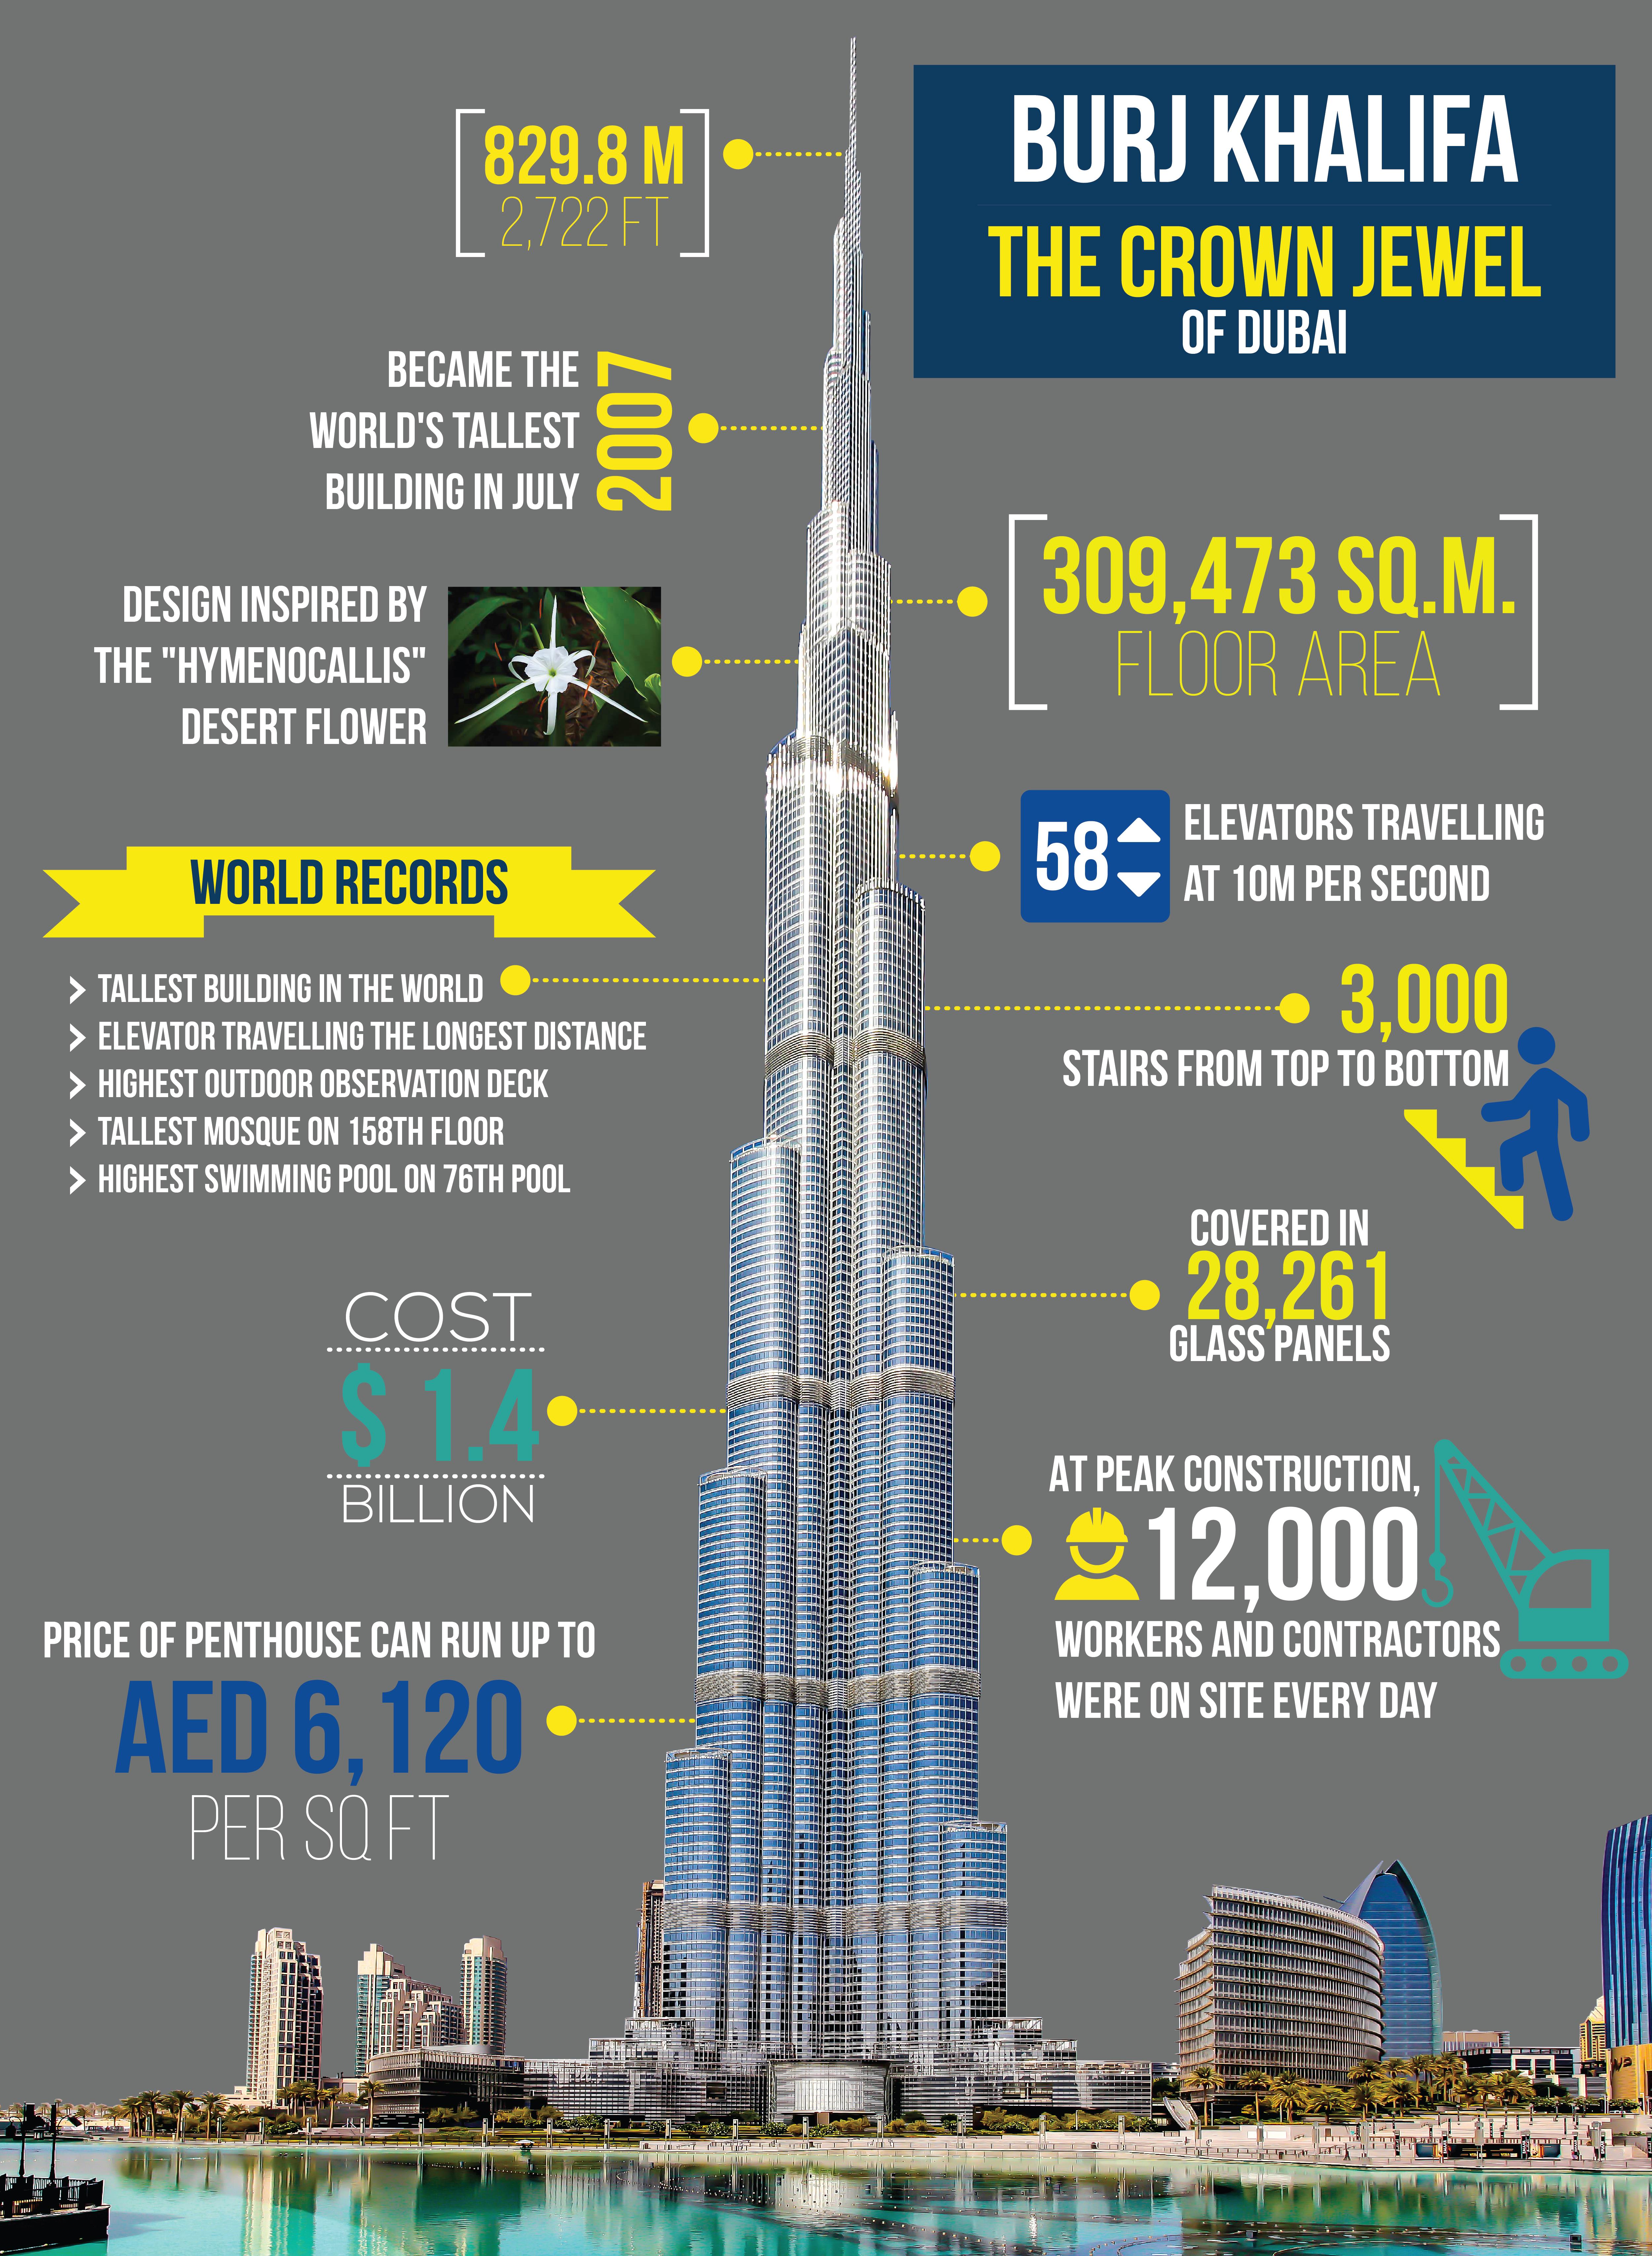 Burj Khalifa infographic, Driven Properties